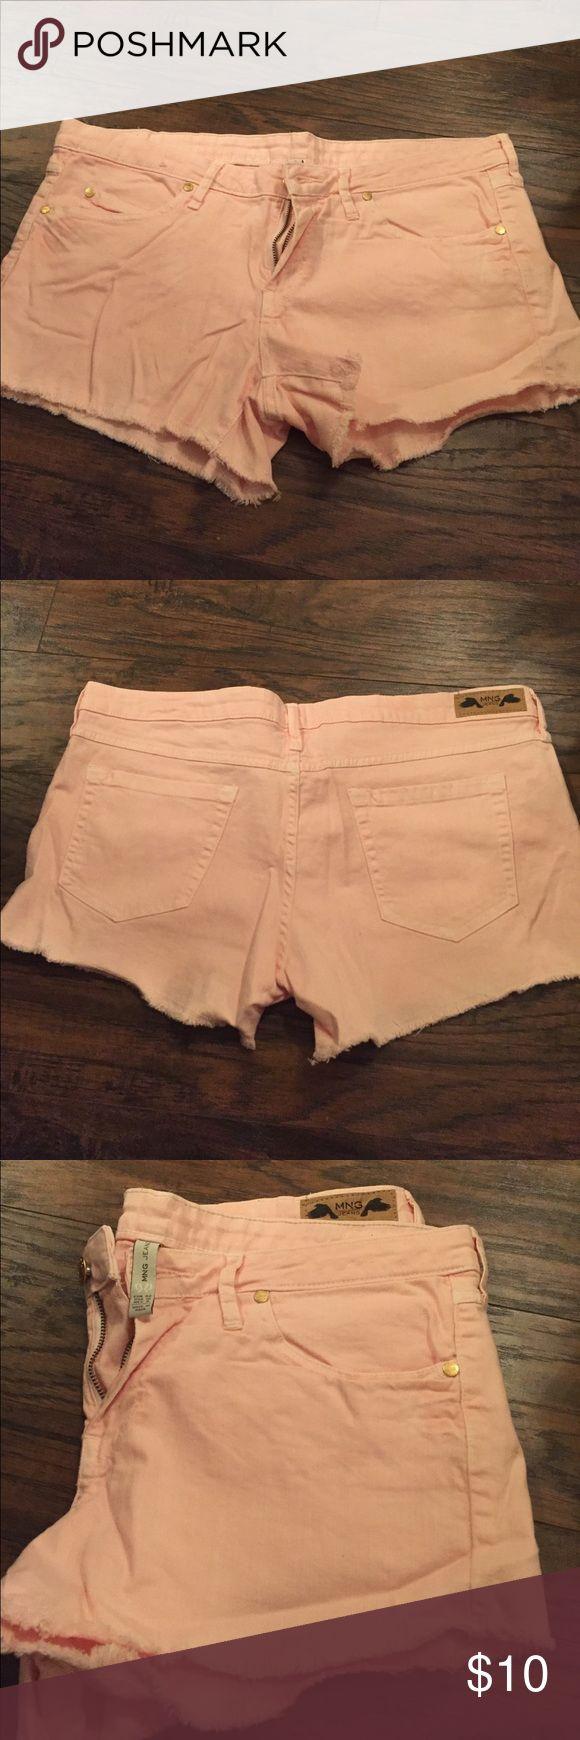 Light pink shorts Light pink shorts with bottom fraying Shorts Jean Shorts